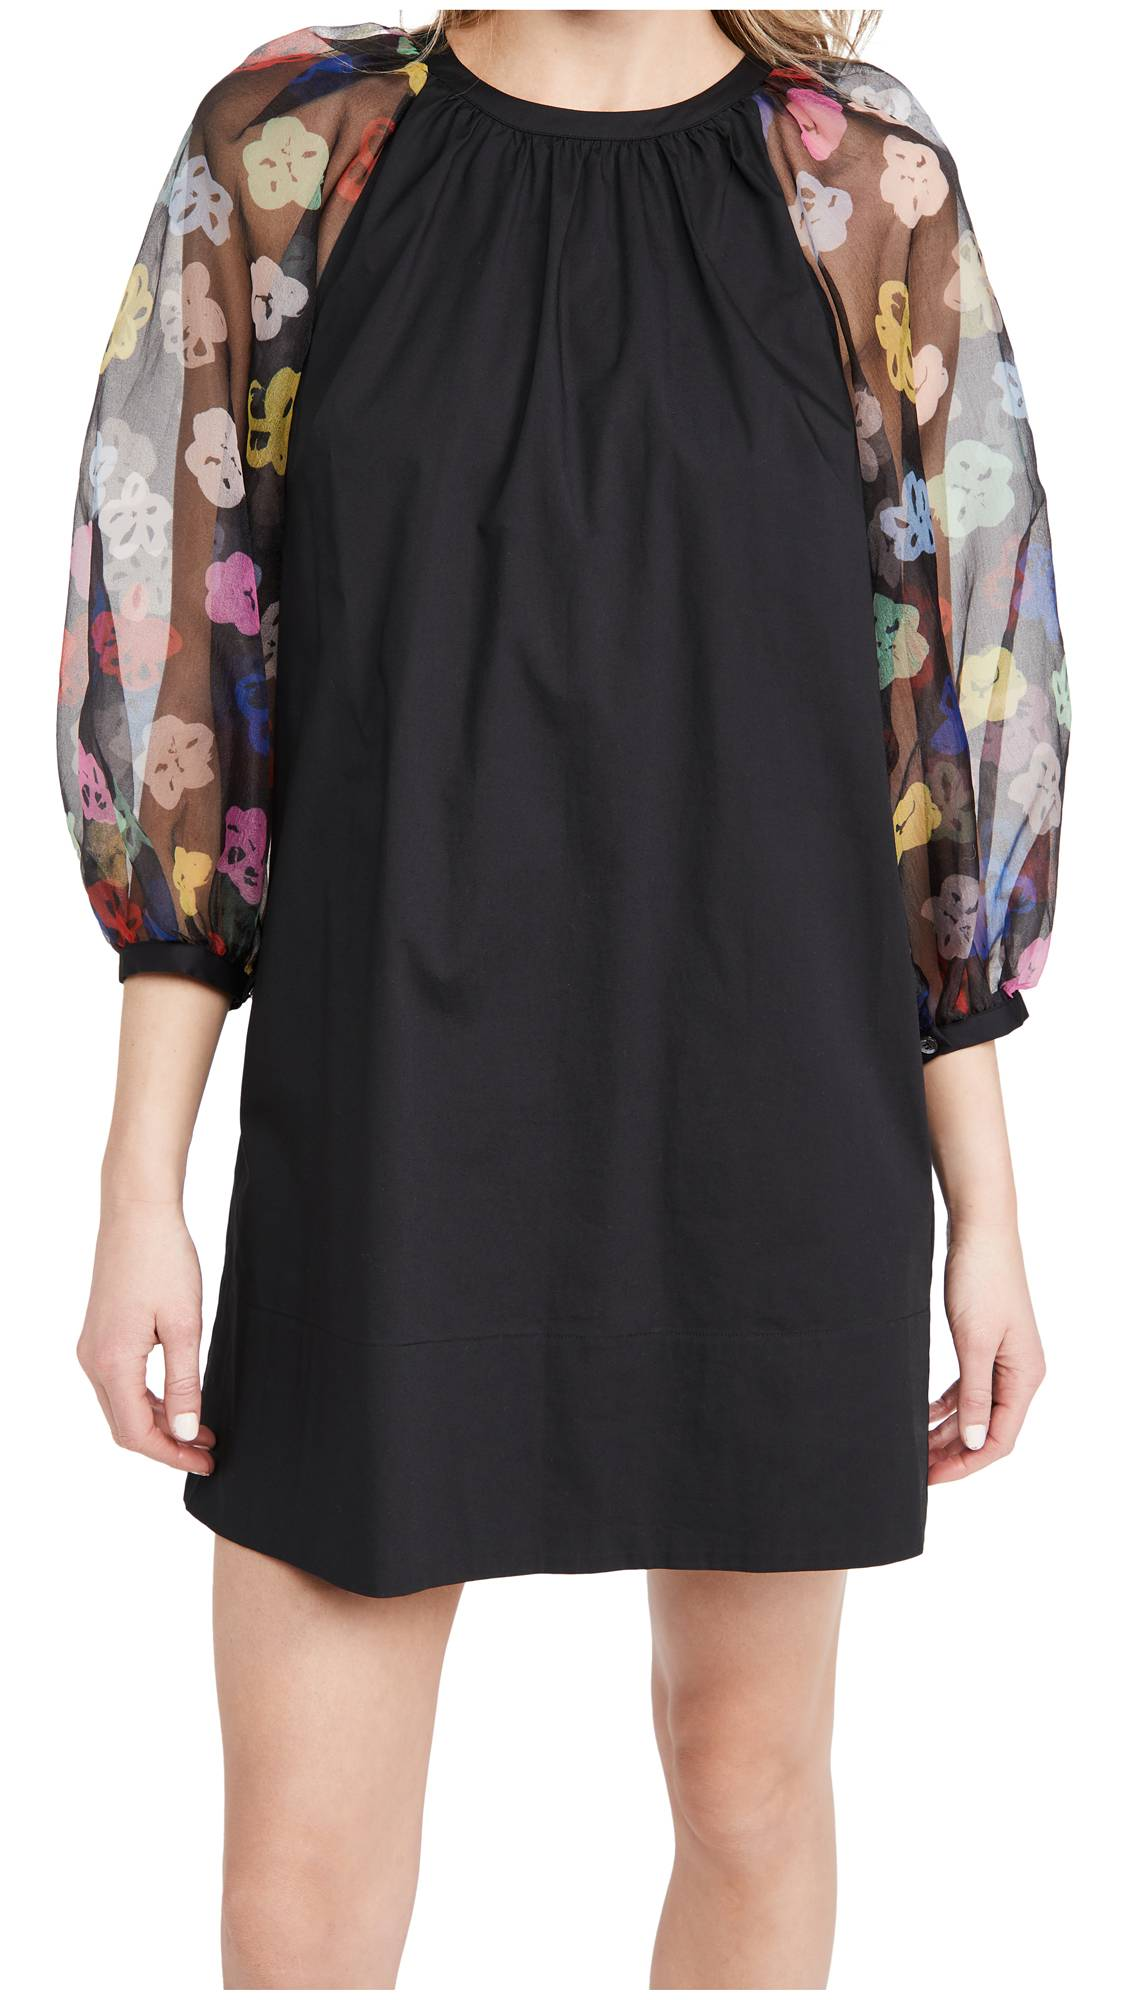 STAUD Garden Dress  - Rainbow Bloom Black - Size: Large